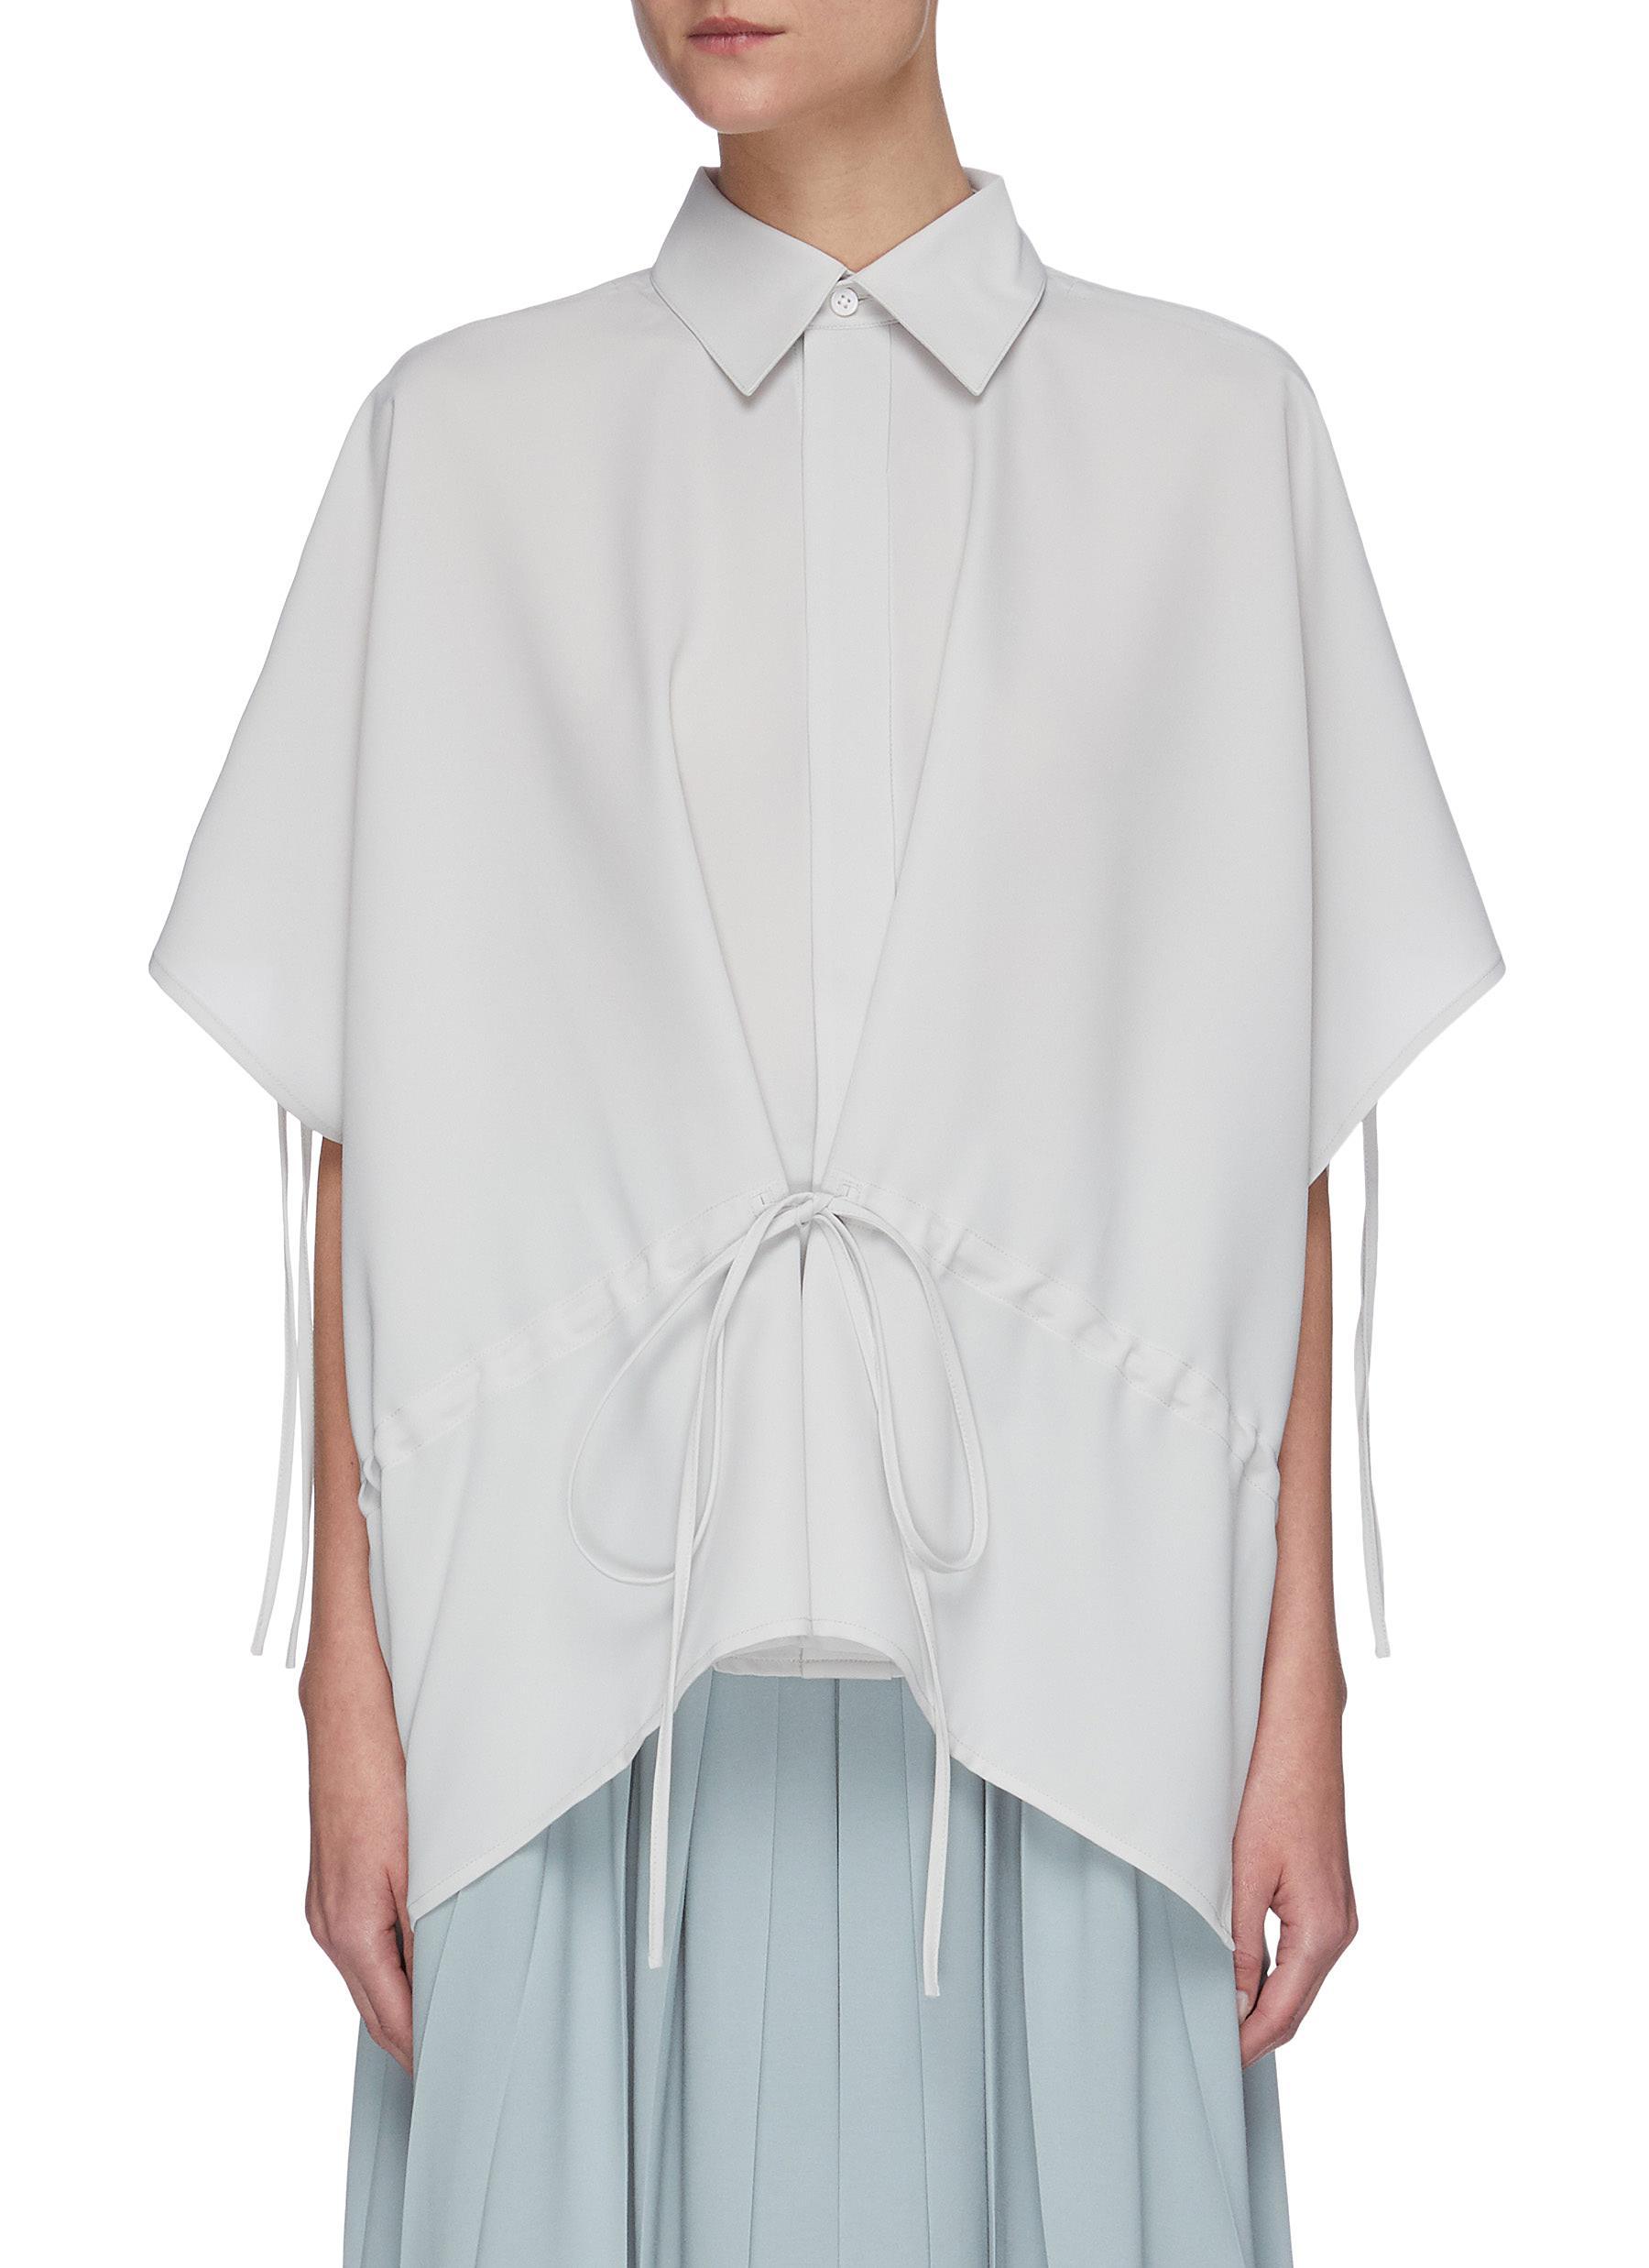 shop Sans Titre Drawstring waist placket shirt online